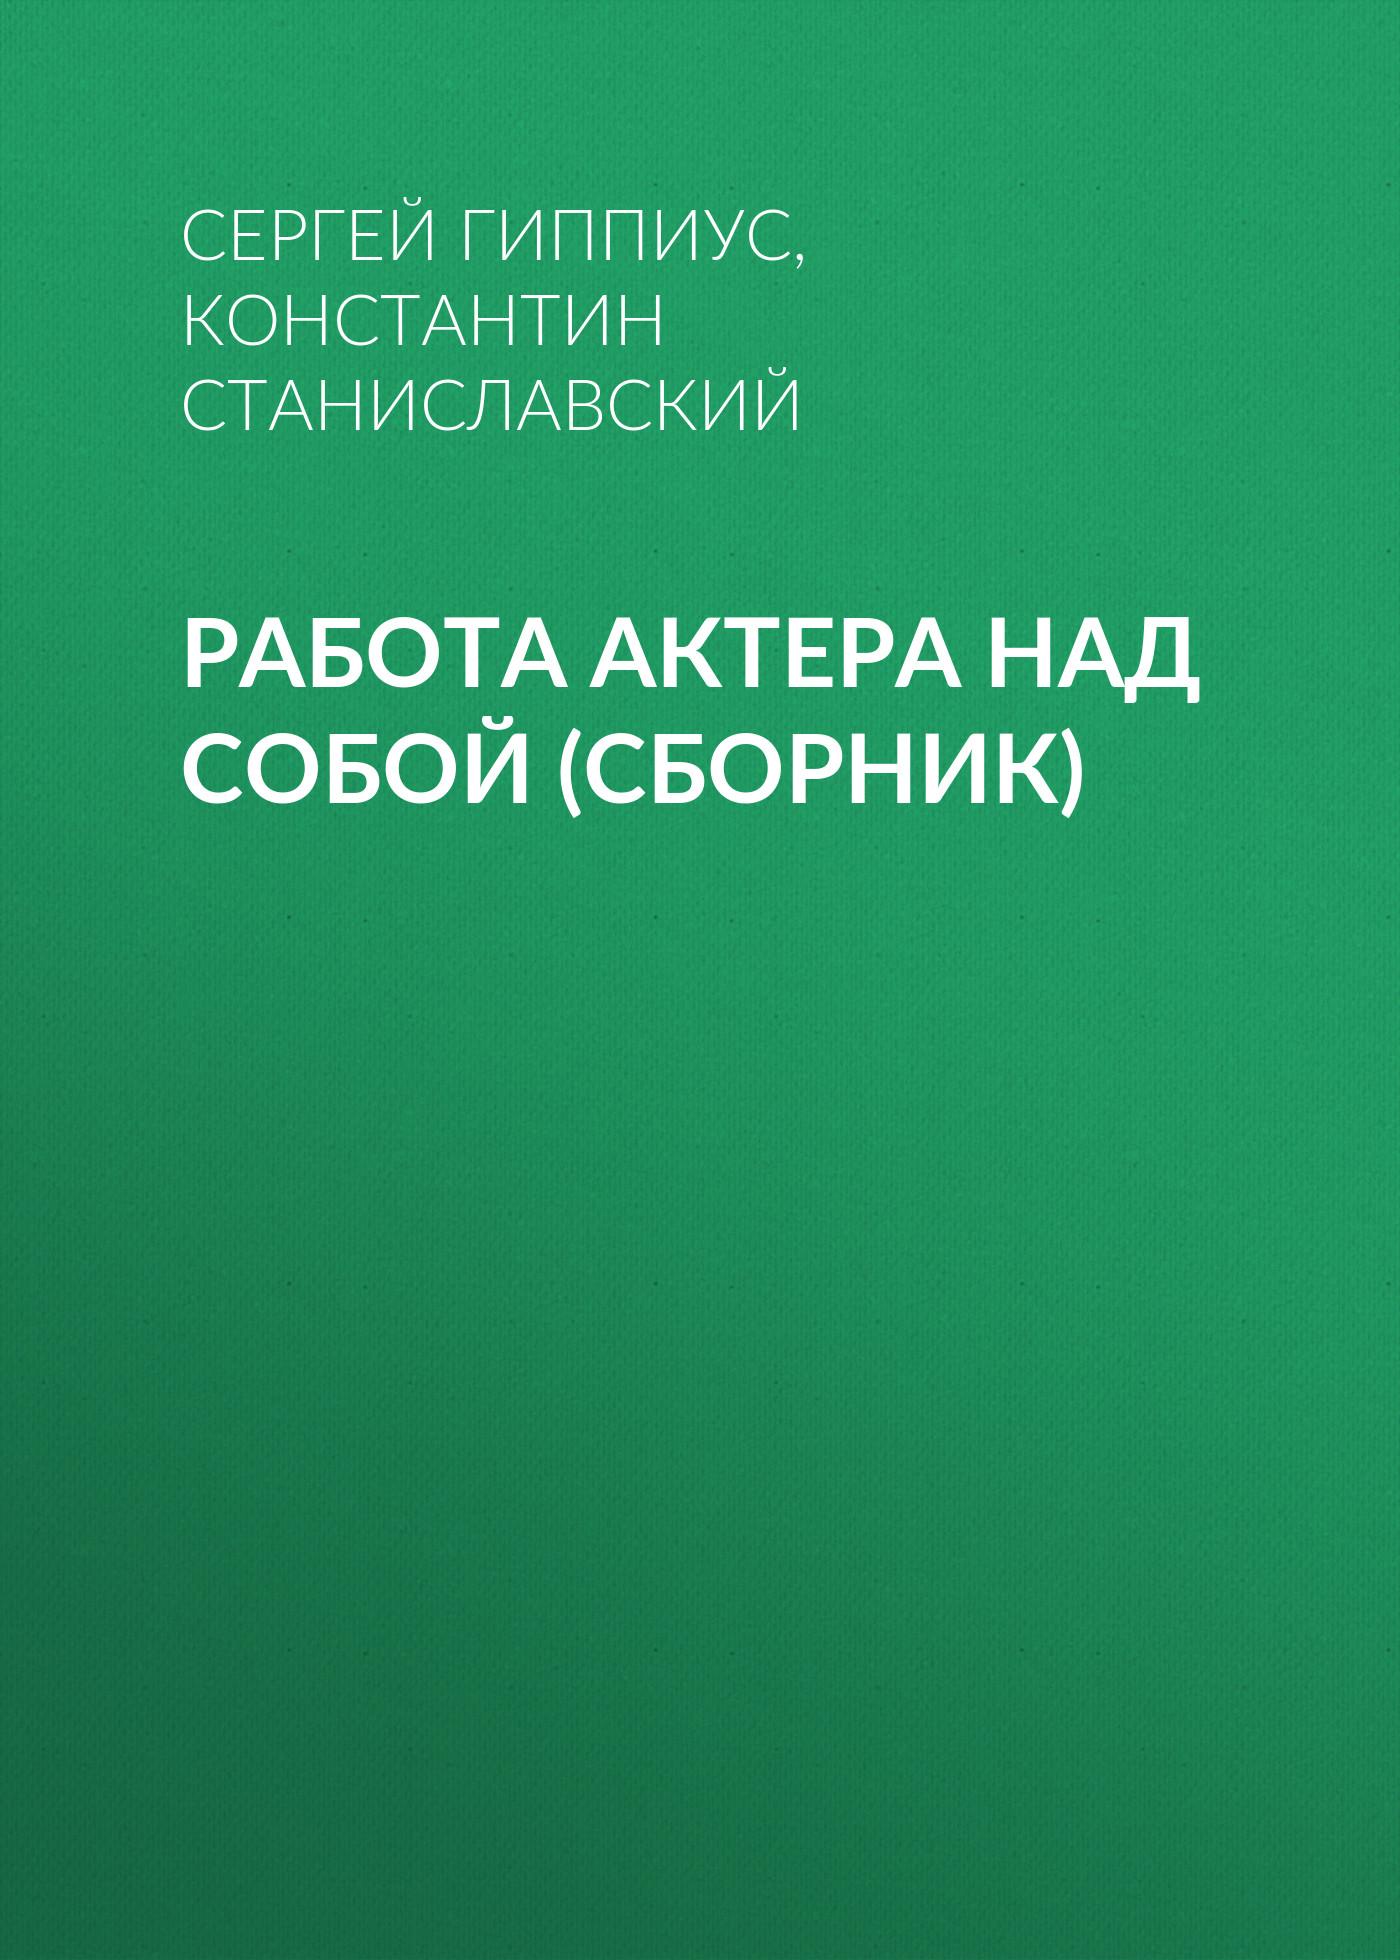 Константин Станиславский Работа актера над собой (сборник) к станиславский работа актера над собой часть 2